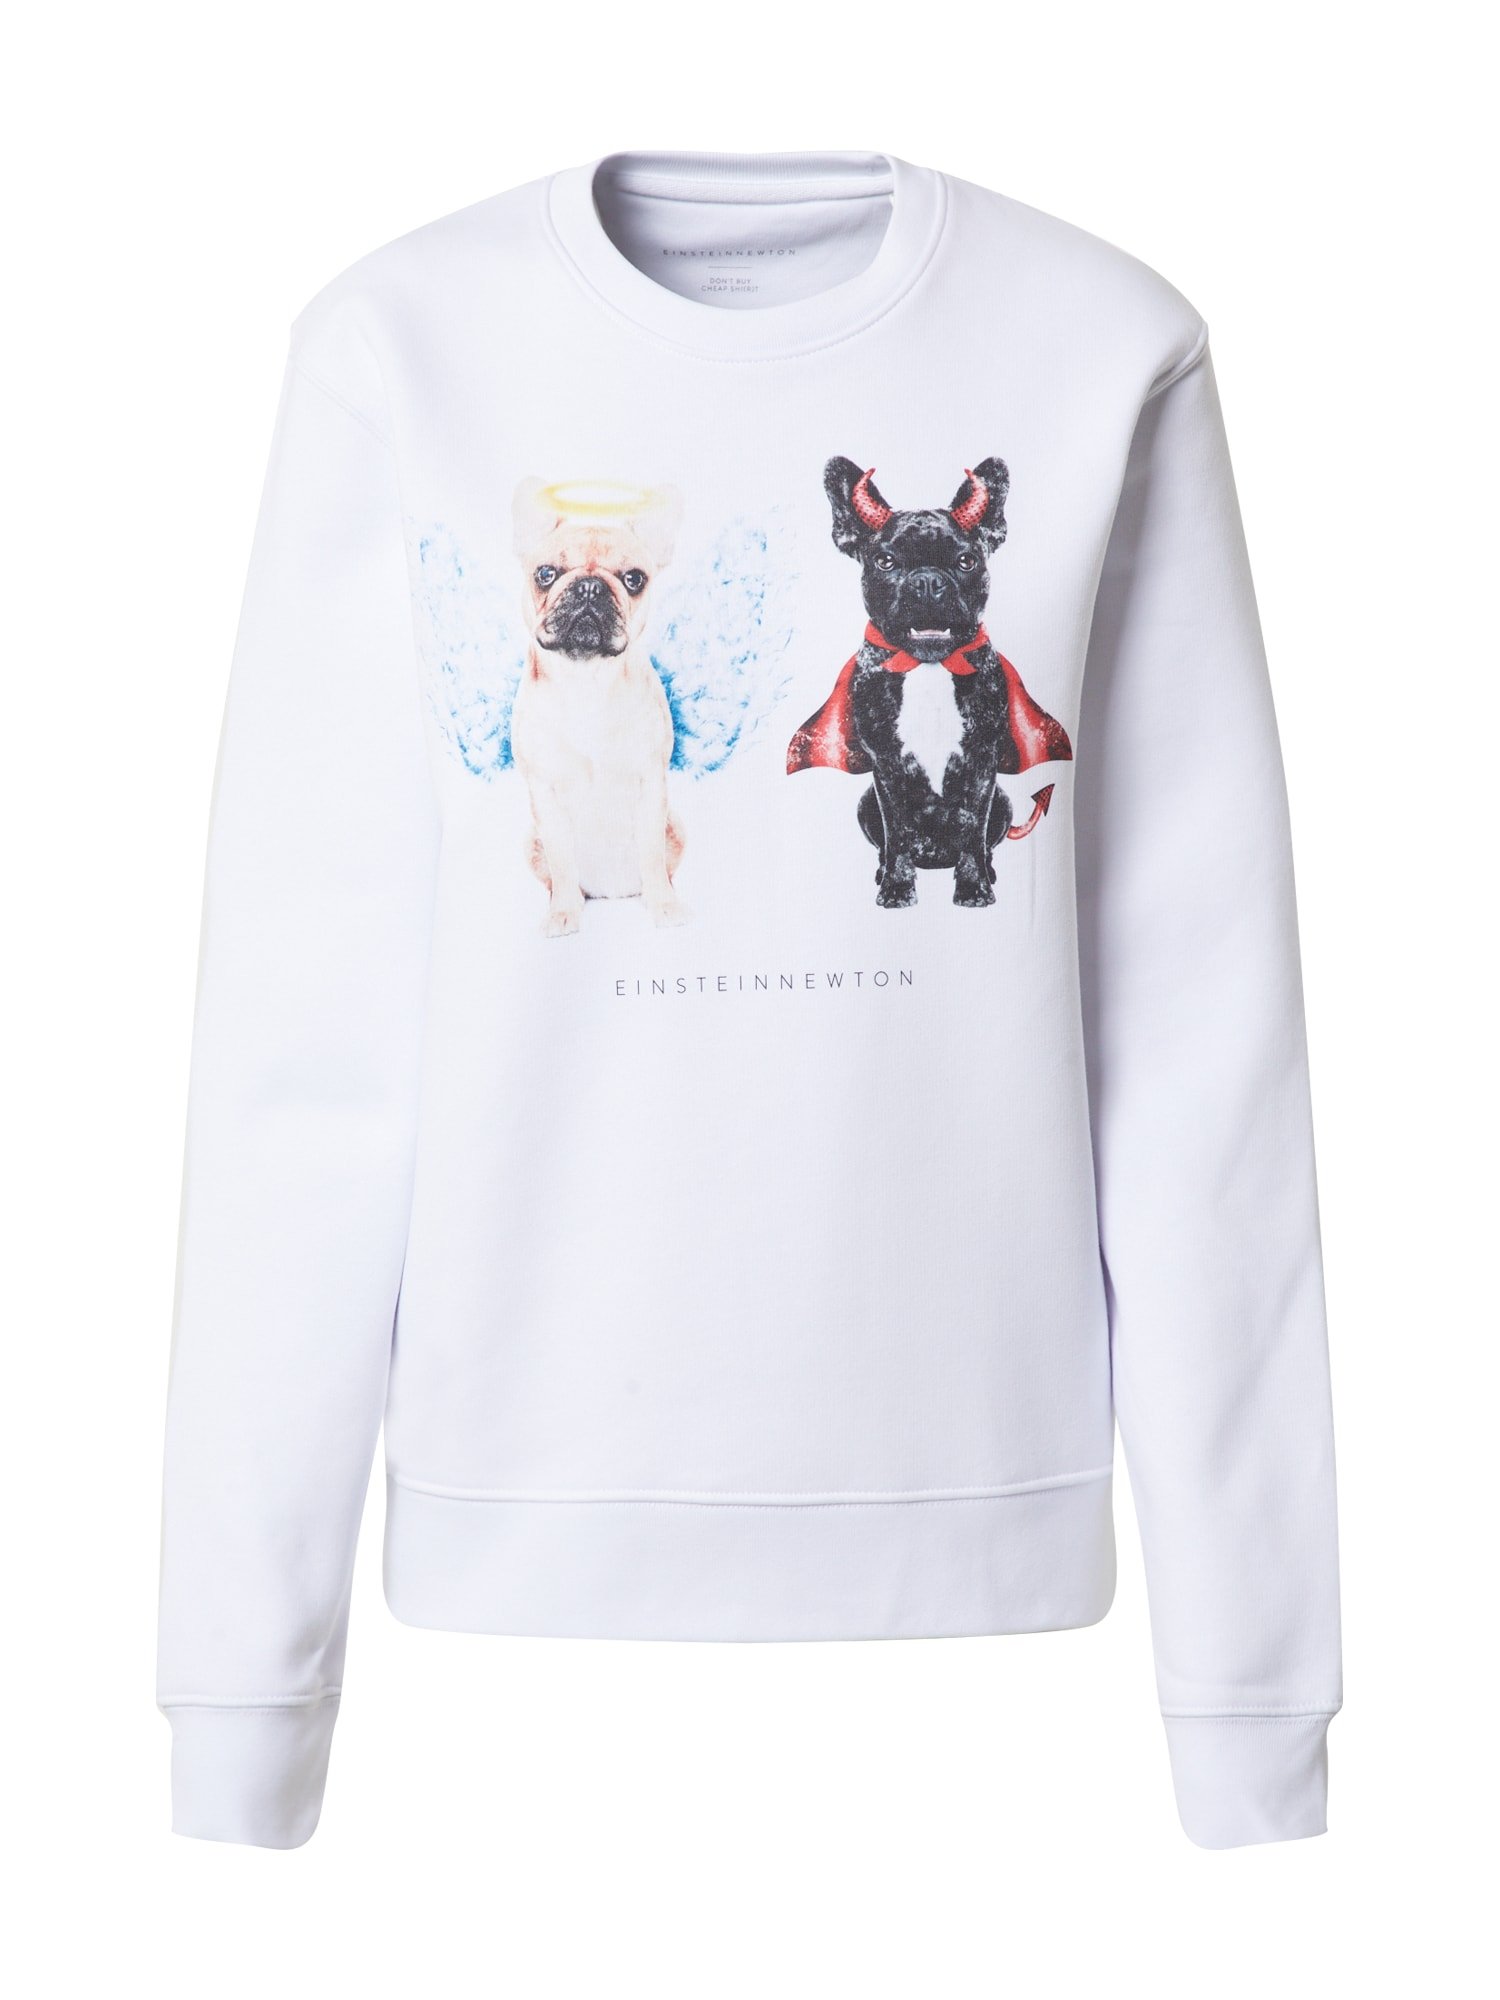 EINSTEIN & NEWTON Megztinis be užsegimo 'Good Dogs Sweatshirt Klara Geist' mišrios spalvos / balta